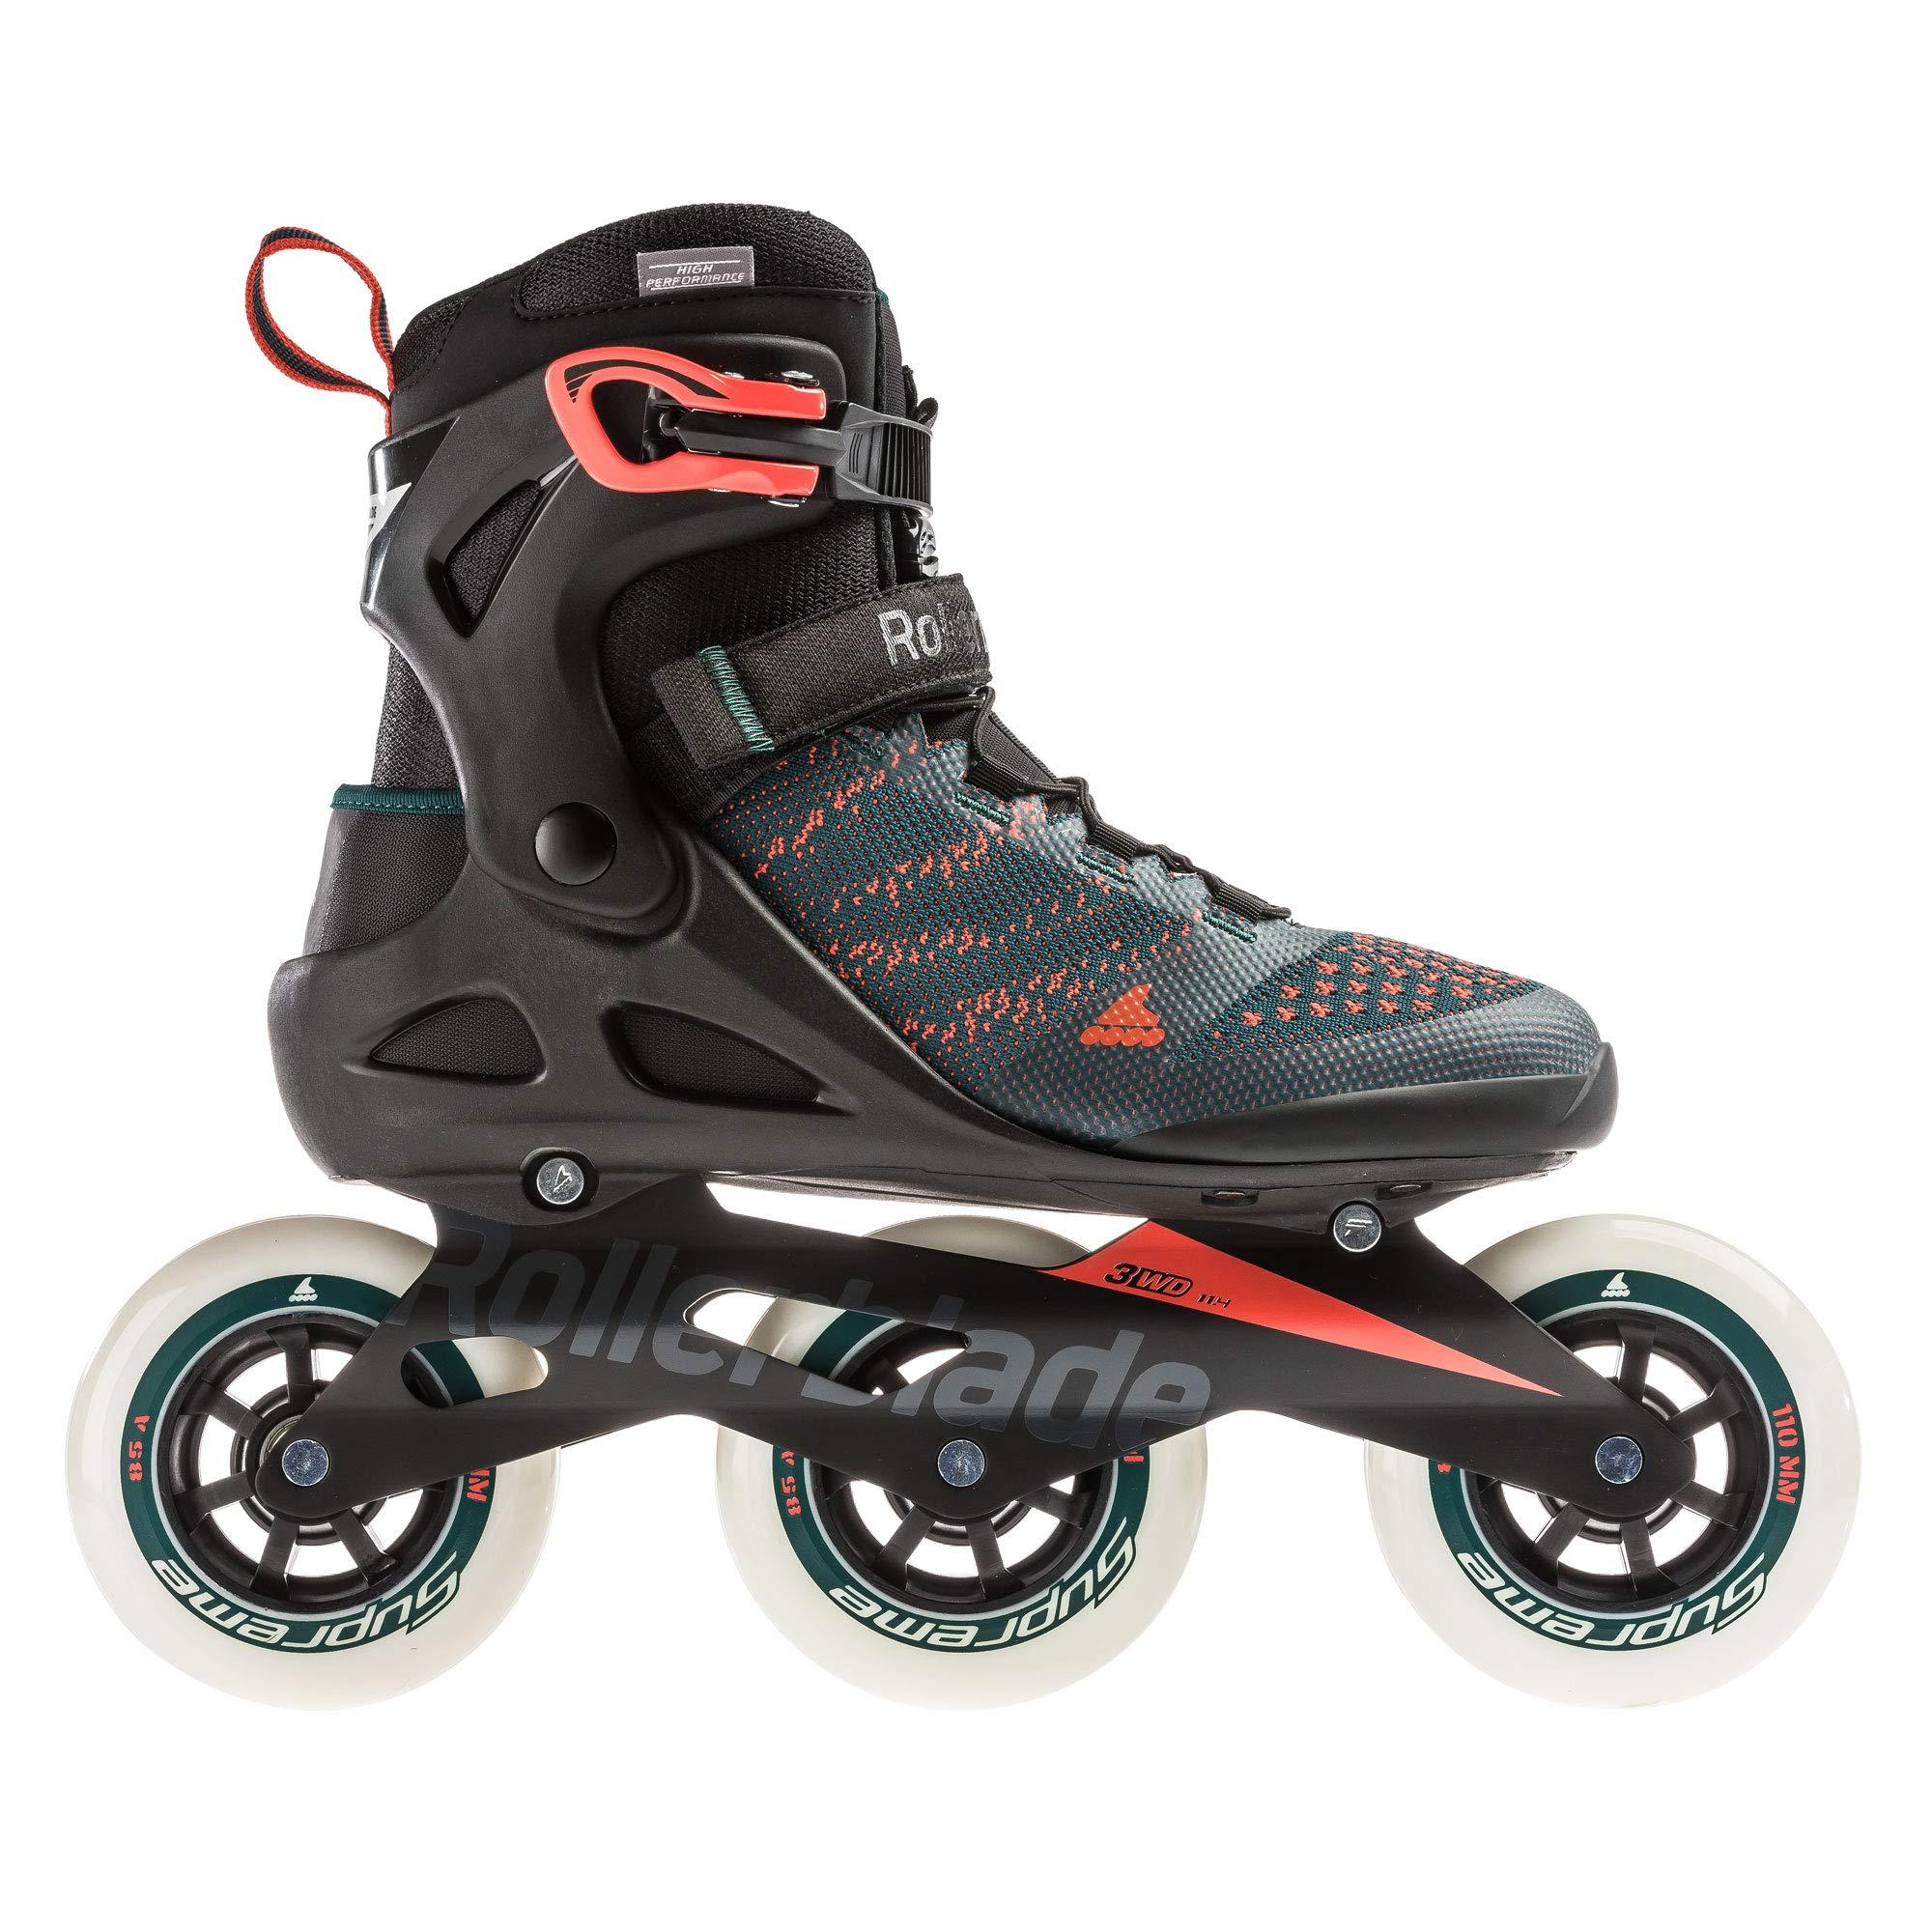 Rollerblade Macroblade 110 3Wd Men's Adult Fitness Inline Skate, Teal Green/Orange Burst, Medium 8